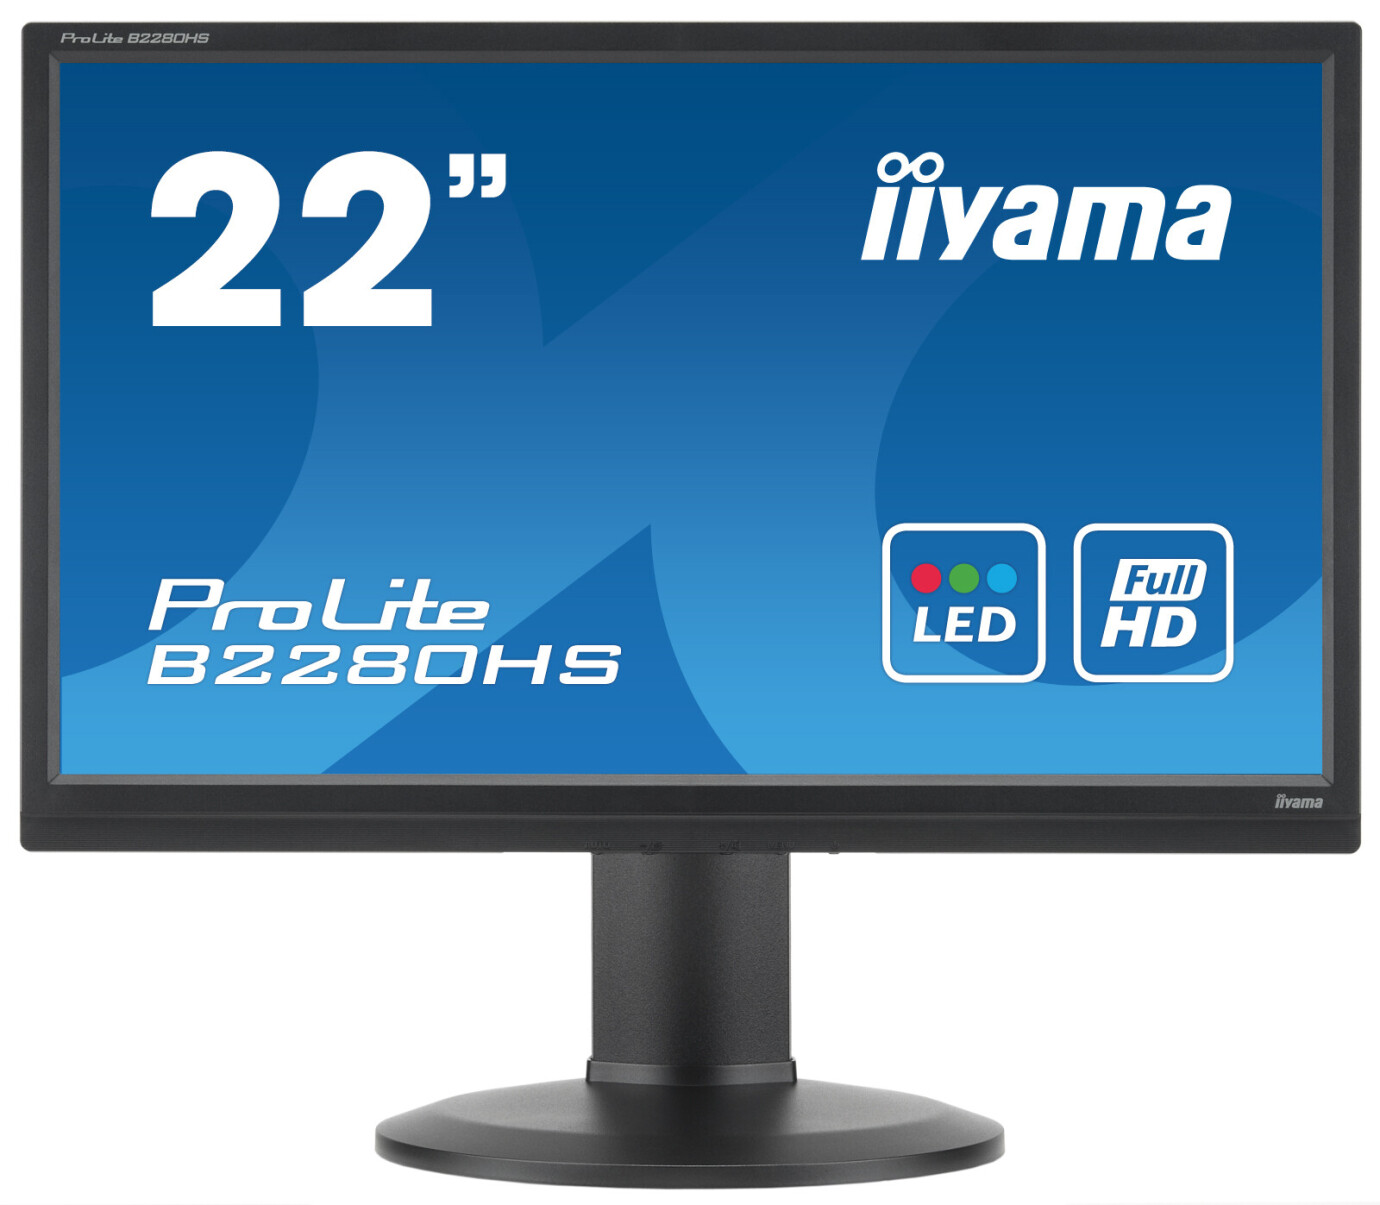 "iiyama B2280HS-W1 22"" LCD Monitor mit Full-HD und 5ms Reaktionszeit"